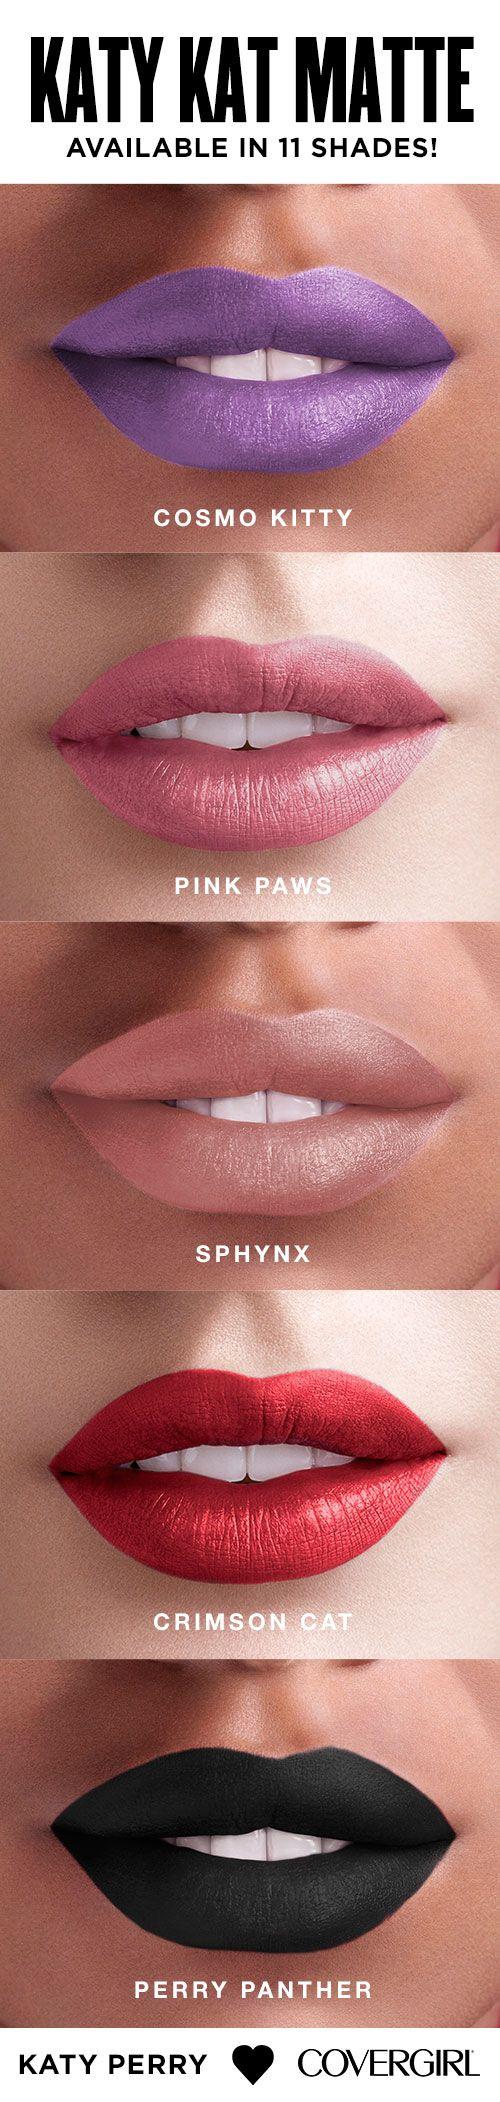 best makeup images on pinterest beauty makeup make up